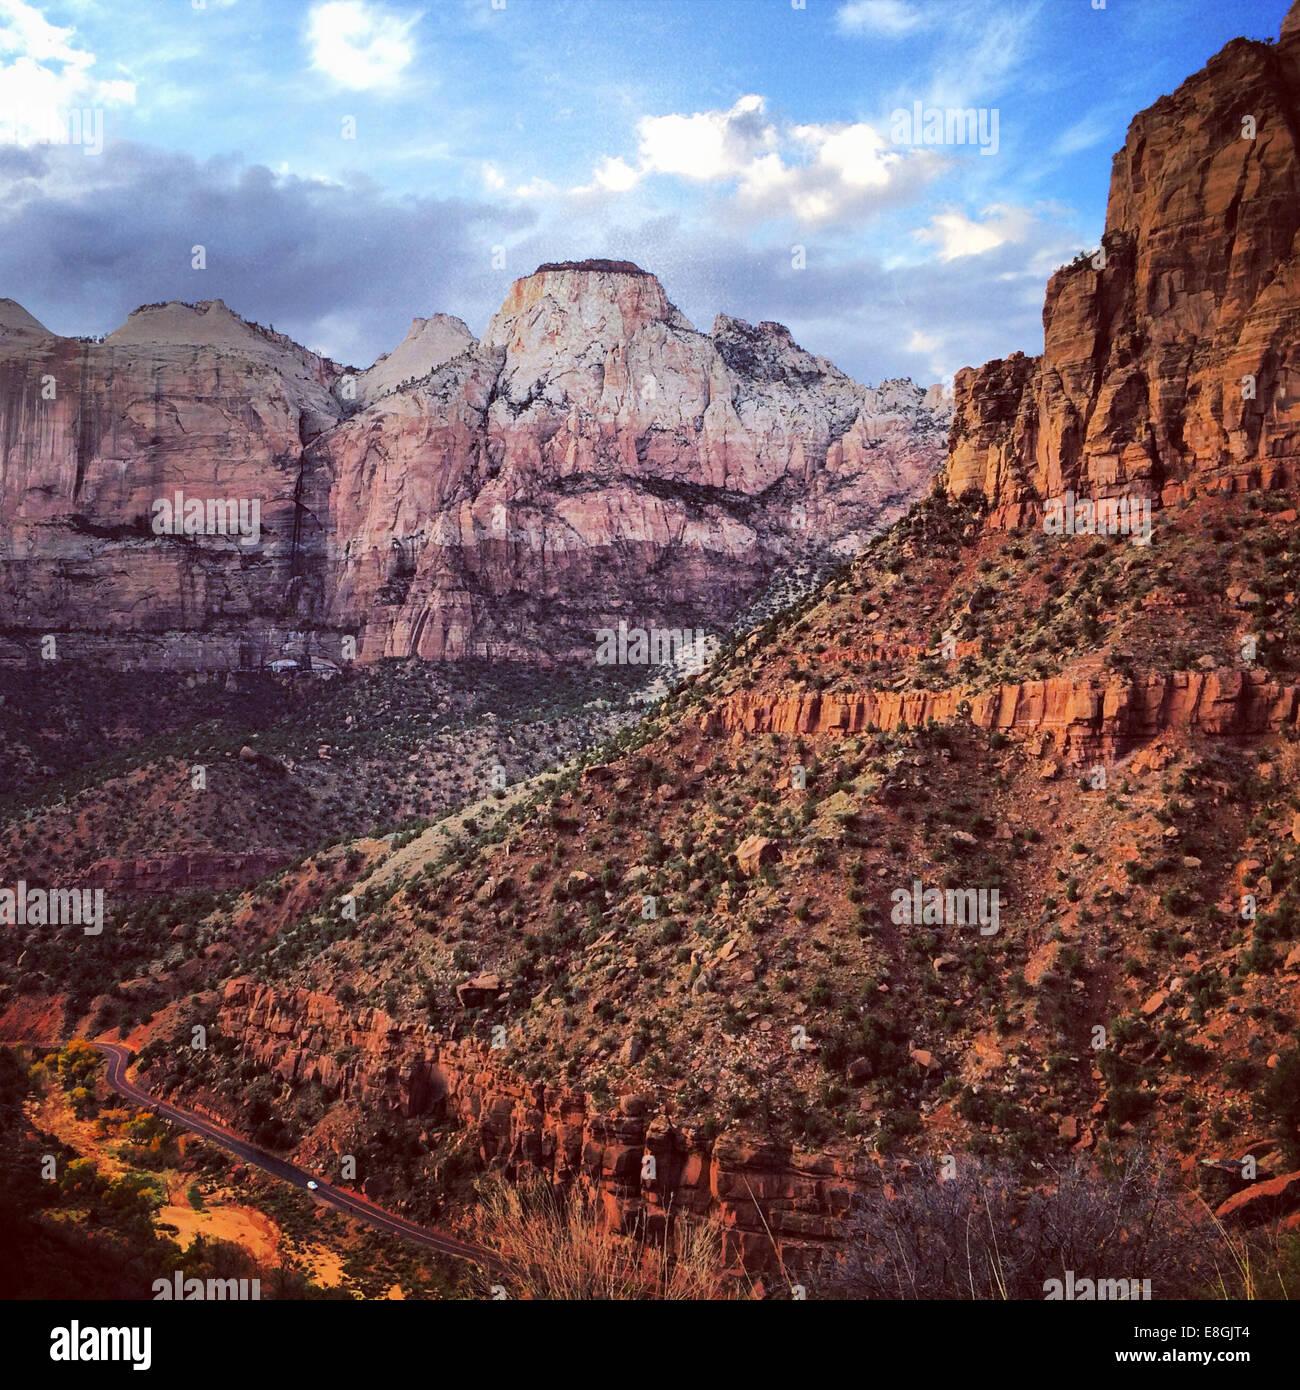 Zion National Park, Utah, America, USA - Stock Image